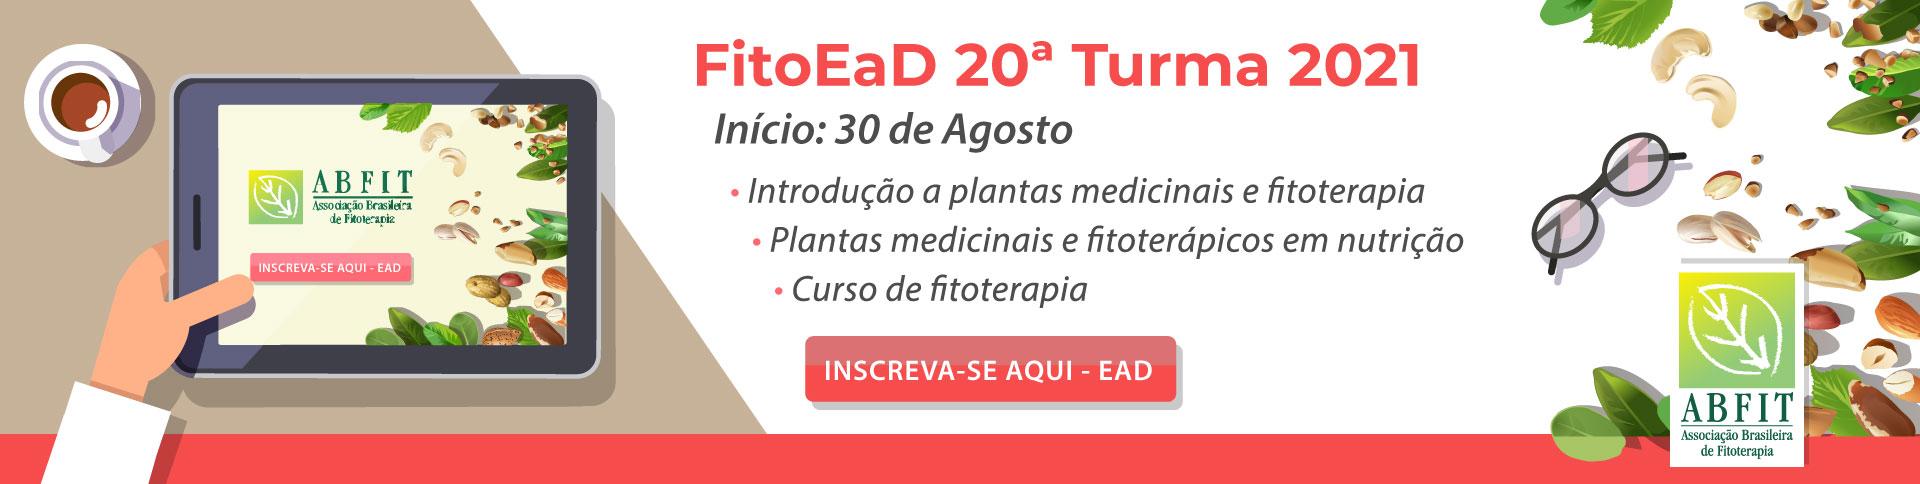 banner-post-FitoEaD-20a-Turma-e-Extensao-2021-08-30-210426.jpg